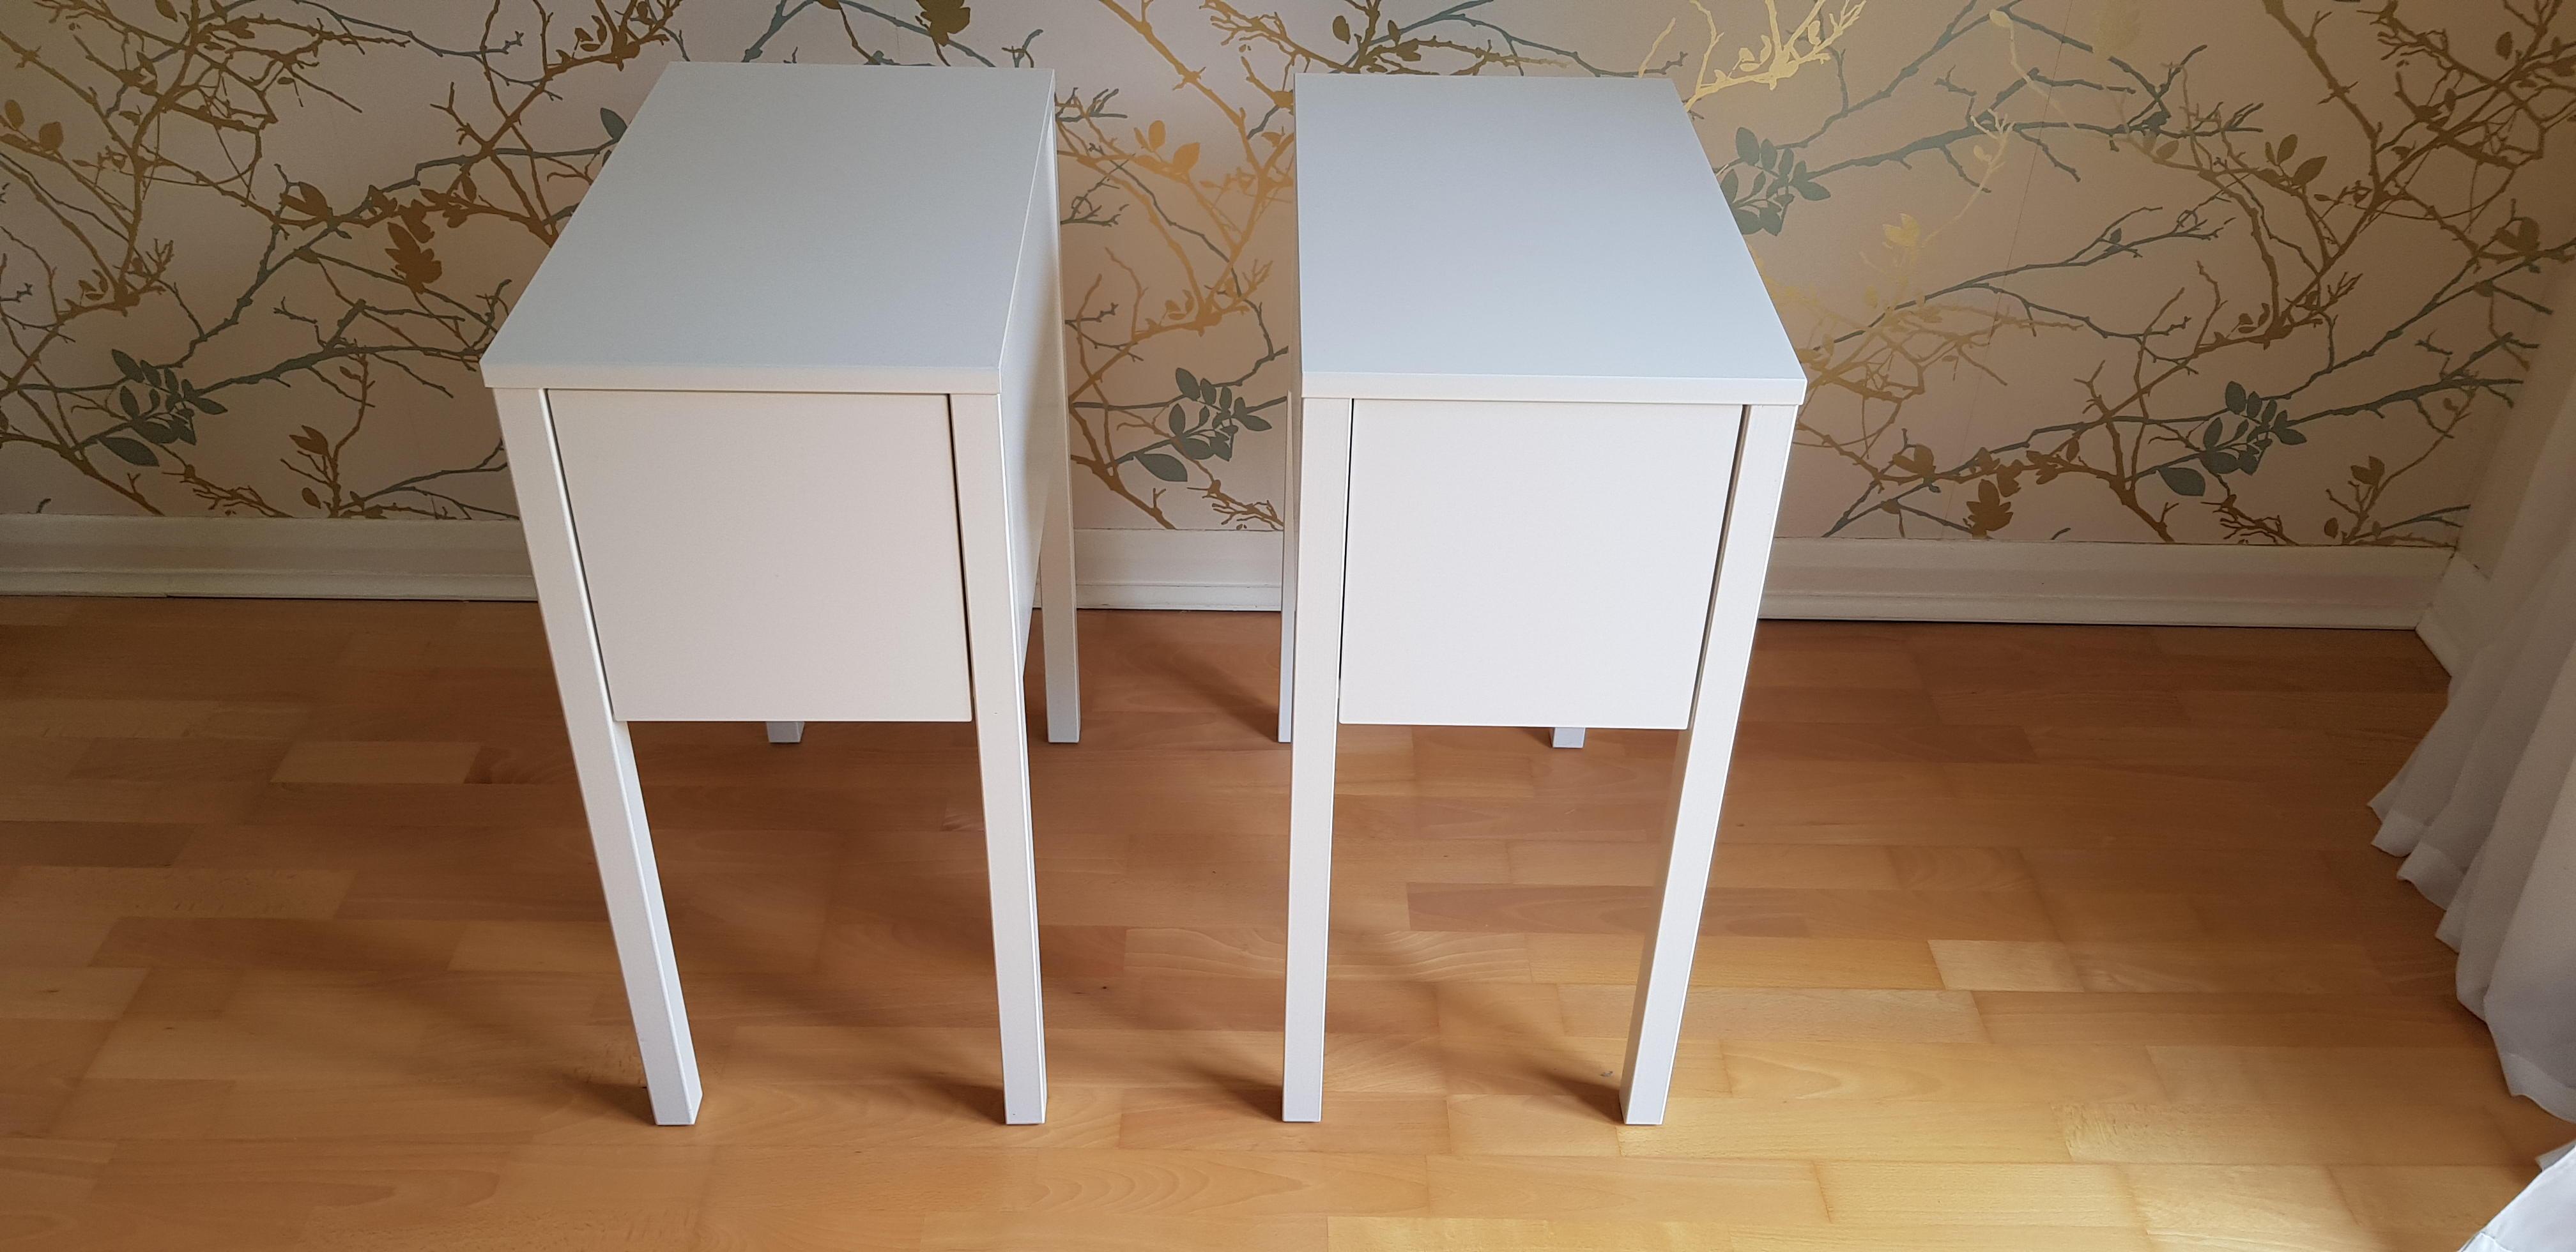 2 Ikea Nordli Bedside Tables In Horsham Expired Friday Ad